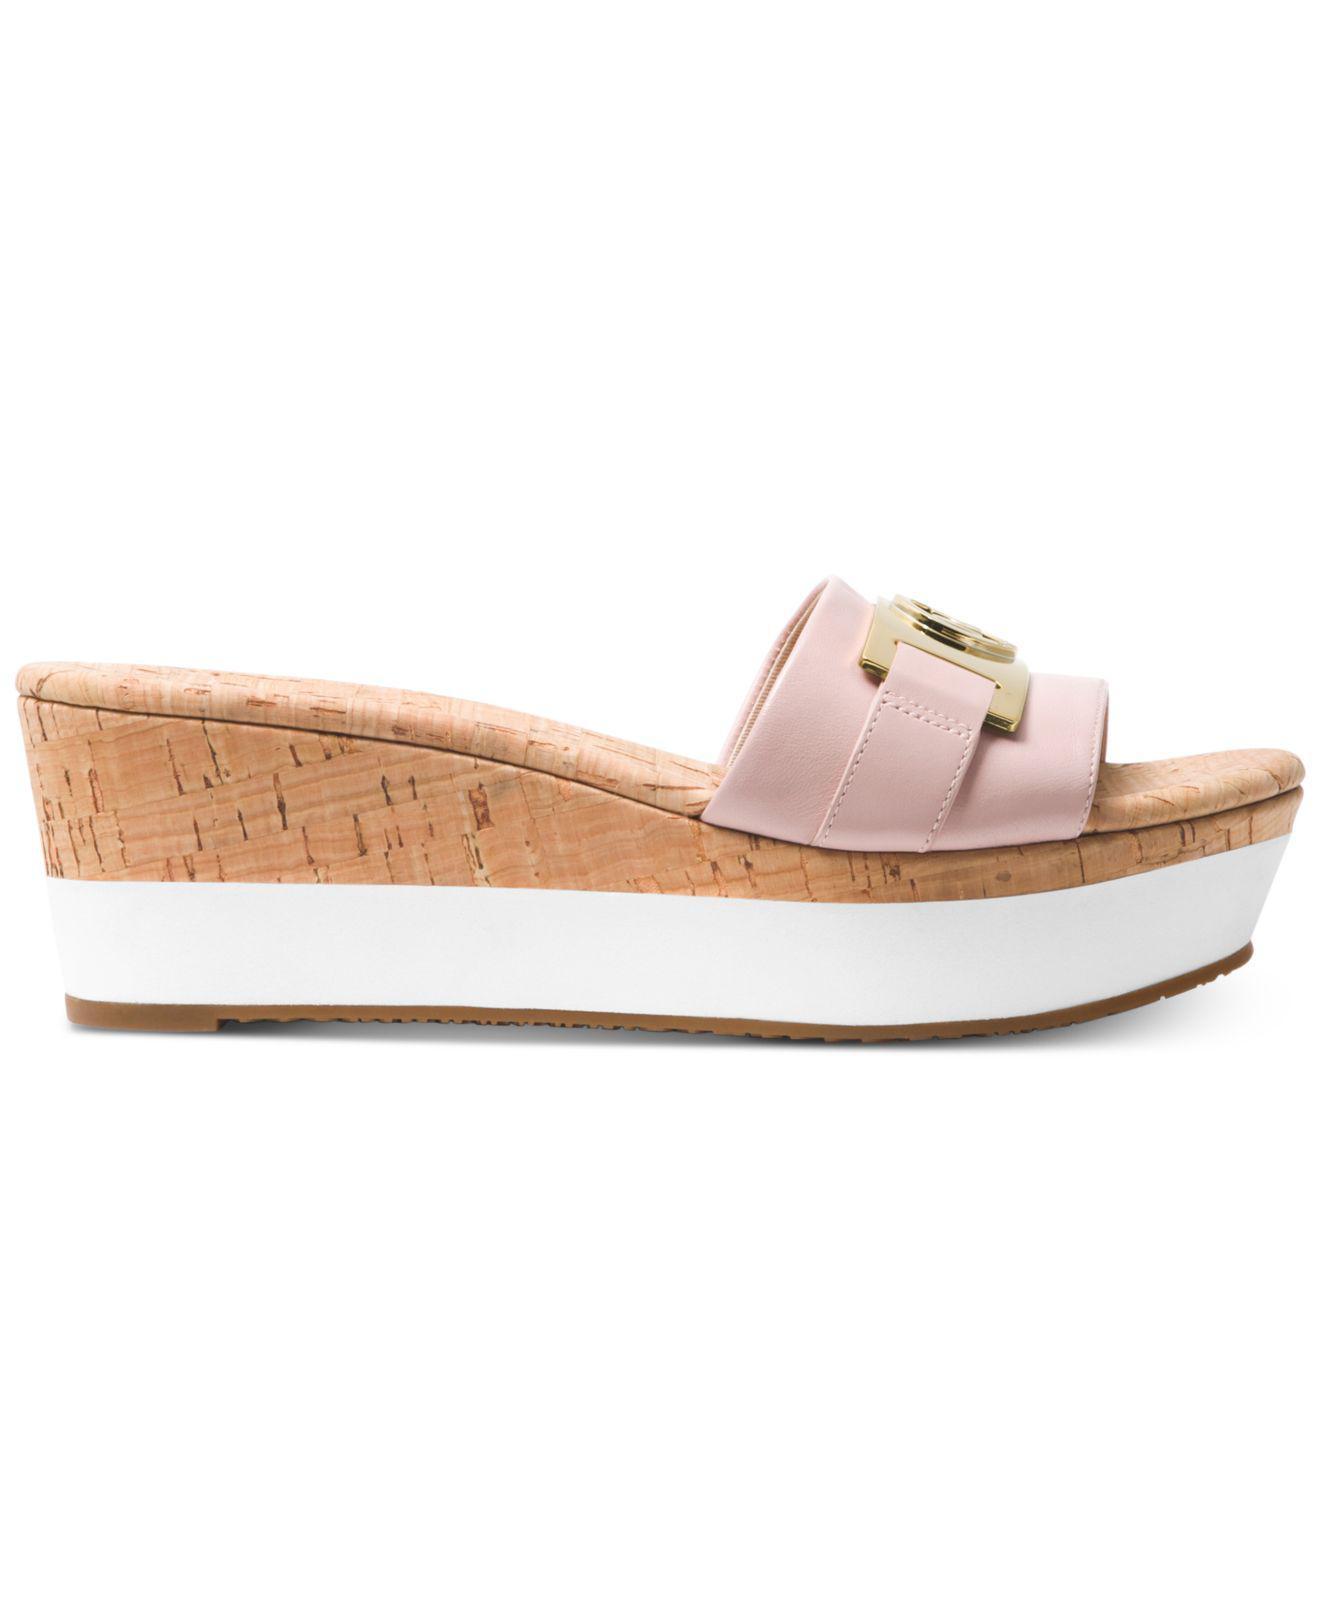 912752e4eb3 Michael Kors Michael Warren Platform Wedge Sandals in Pink - Save 57% - Lyst